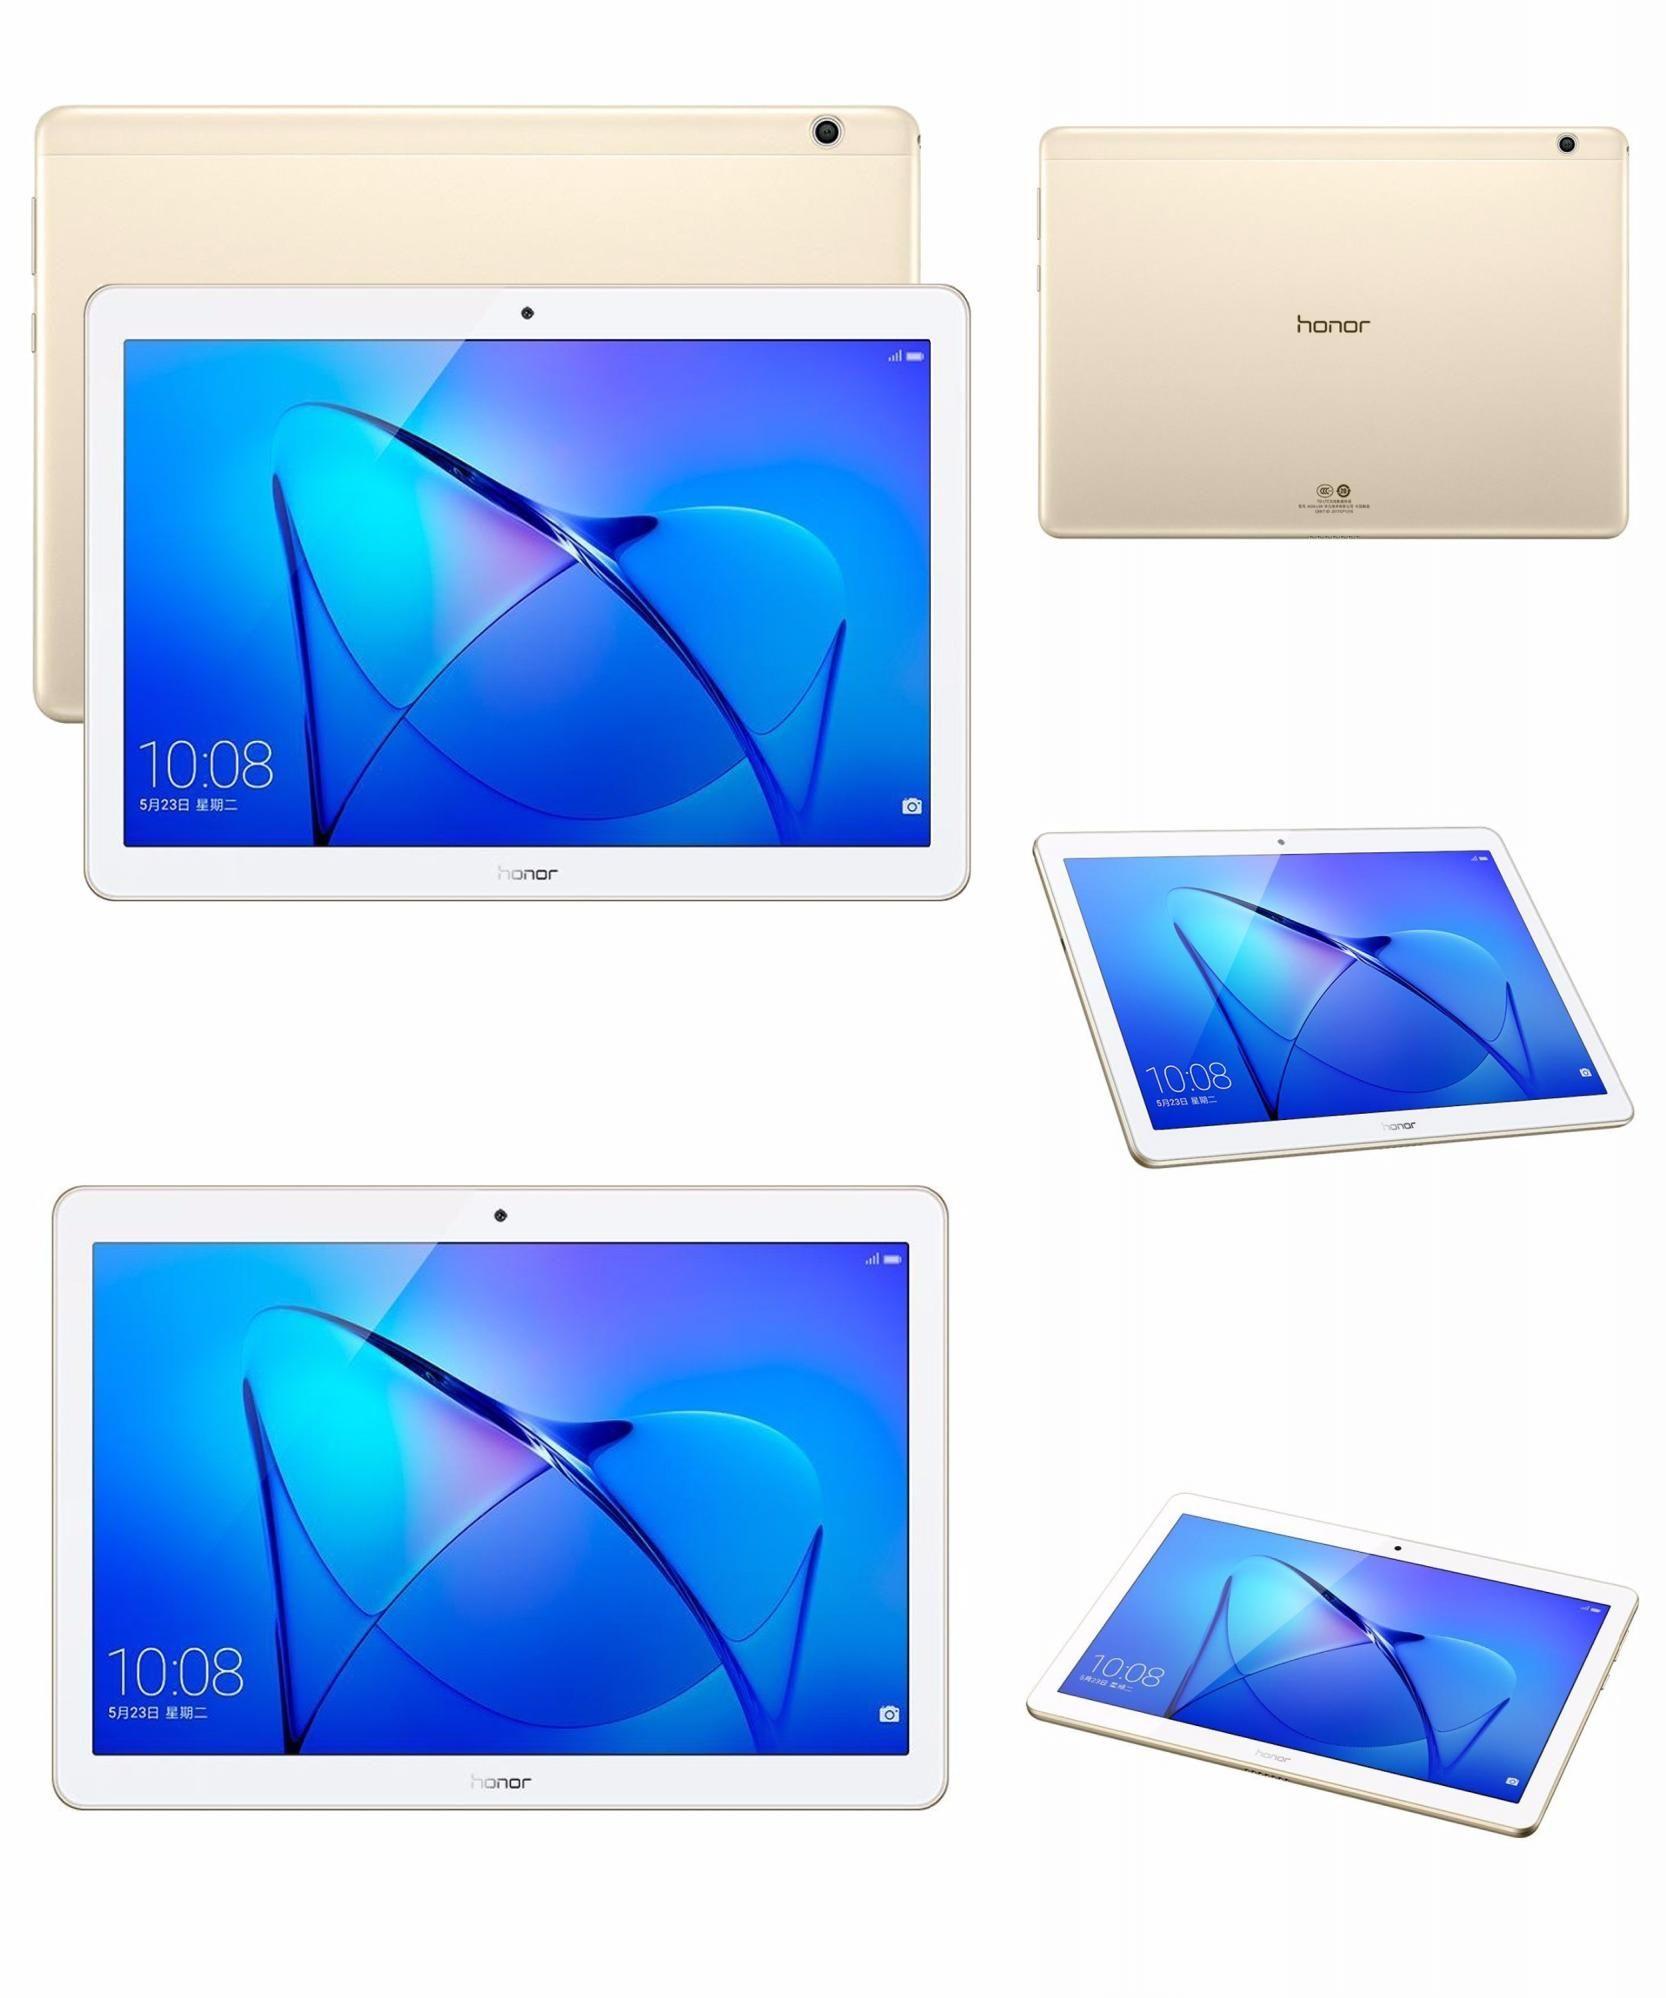 Visit To Buy Original Huawei Mediapad T3 10 Ags L09 4g Phone Call Tablet 9 6 Inch 3gb 32gb Emui 5 1 Snapdragon 425 Quad Core 4x1 4g Tablet Snapdragons Huawei